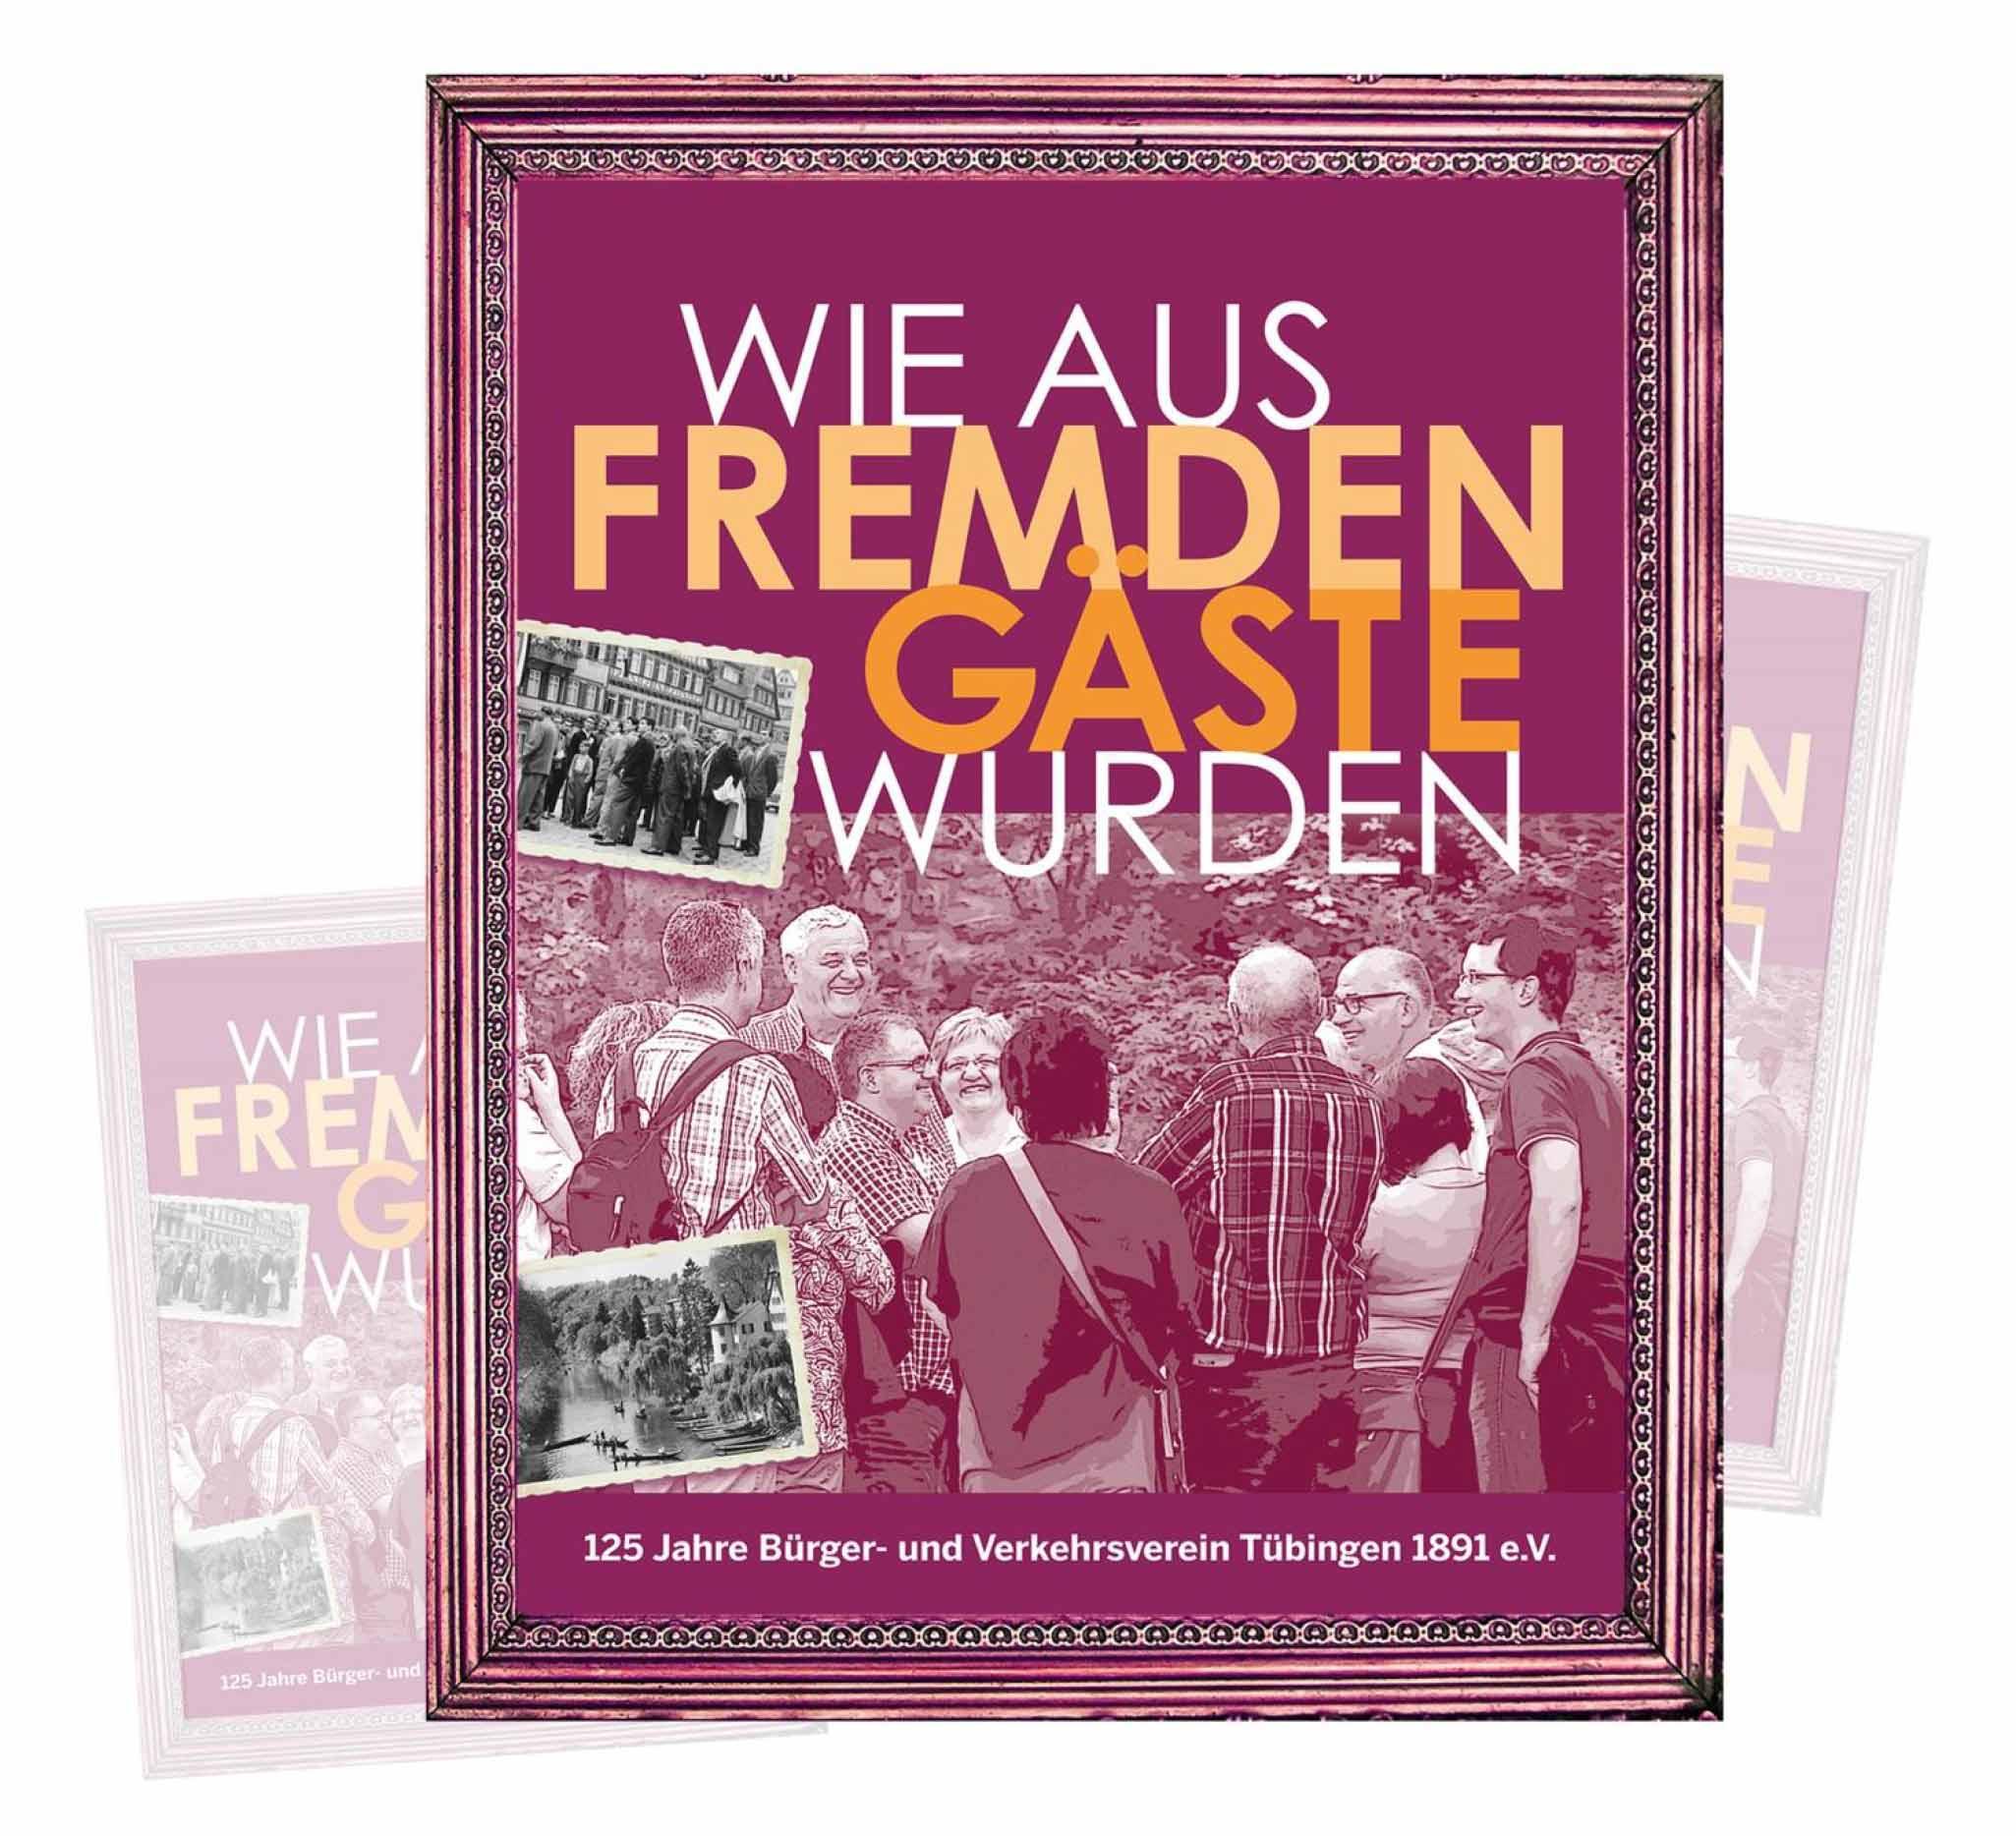 Jubiläumsschrift 125 Jahre Bürger- und Verkehrsverein Tübingen